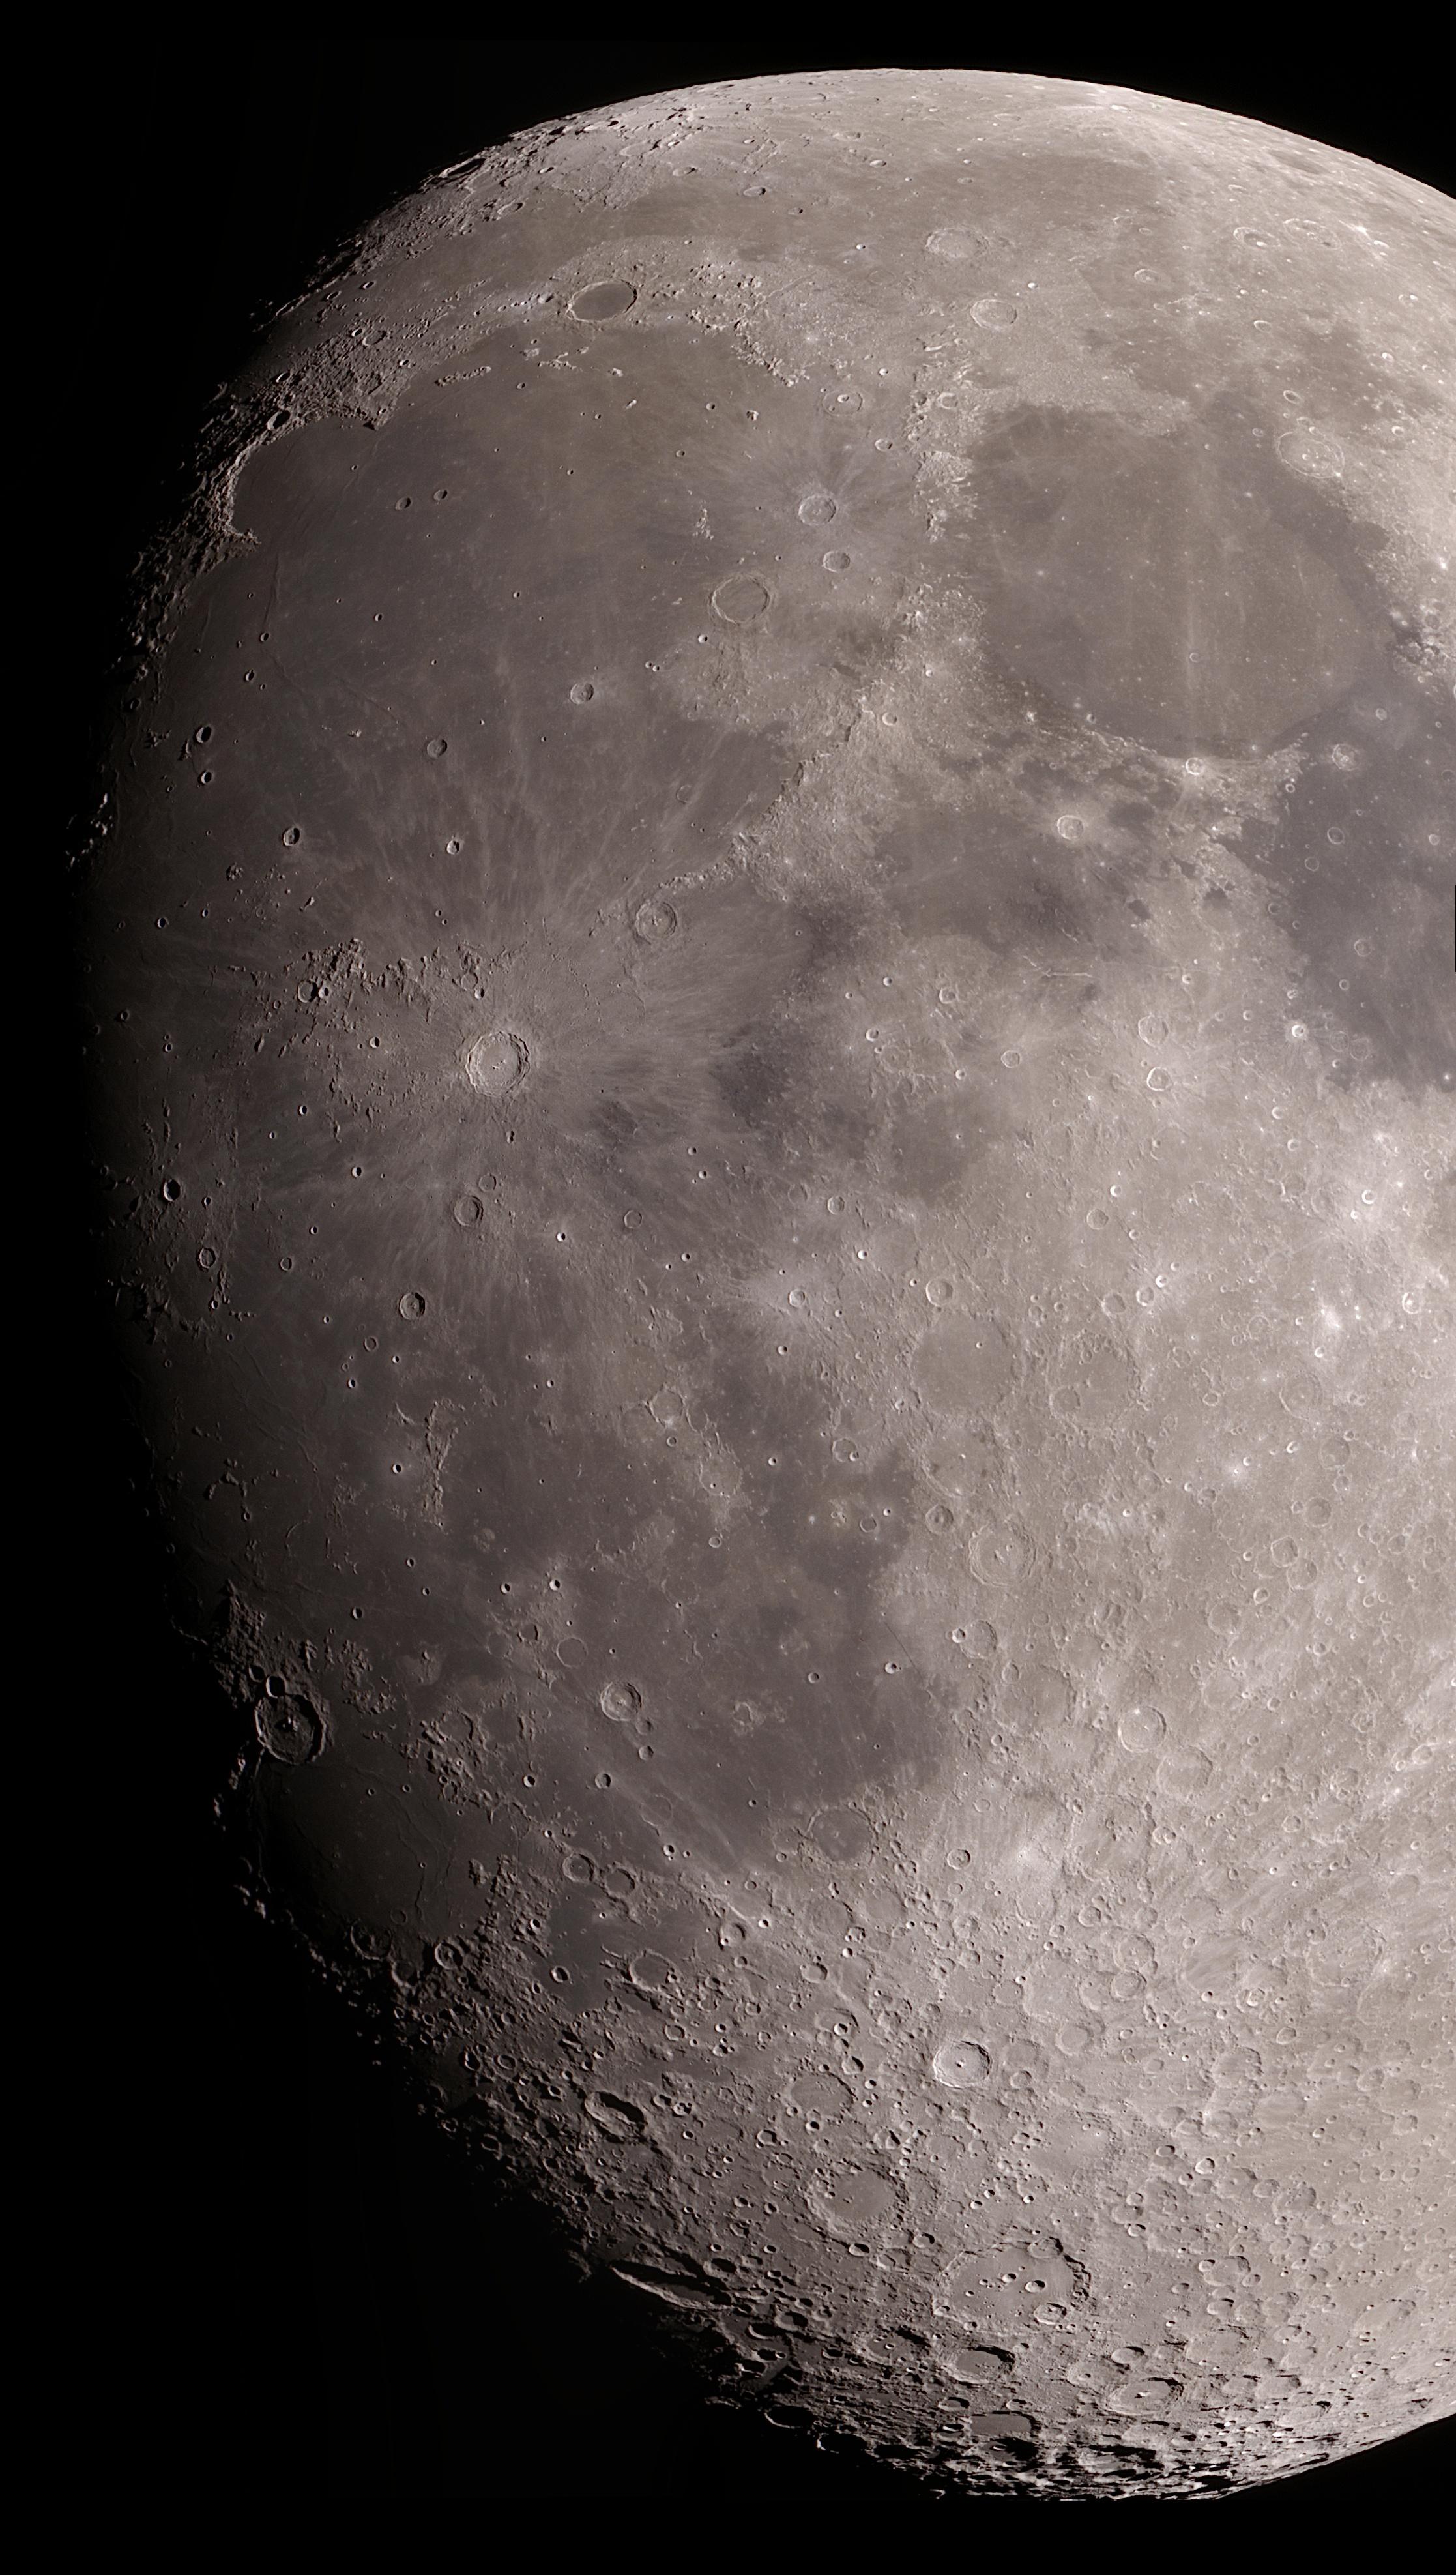 2020-05-03-1945_5-RGB-Moon_lapl4_ap764_D